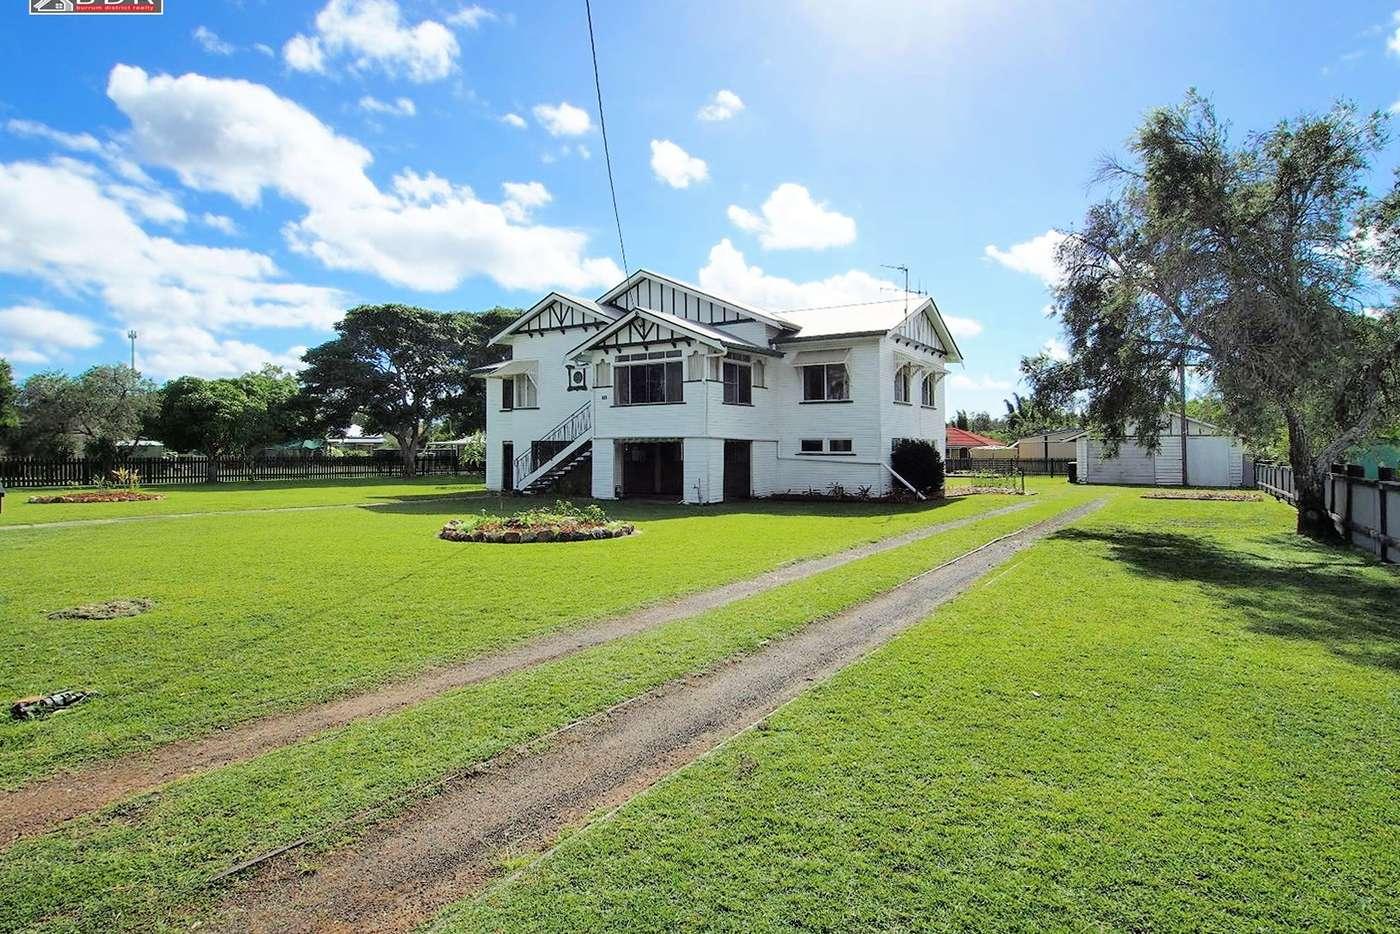 Main view of Homely house listing, 21 Burgowan Rd, Torbanlea QLD 4662